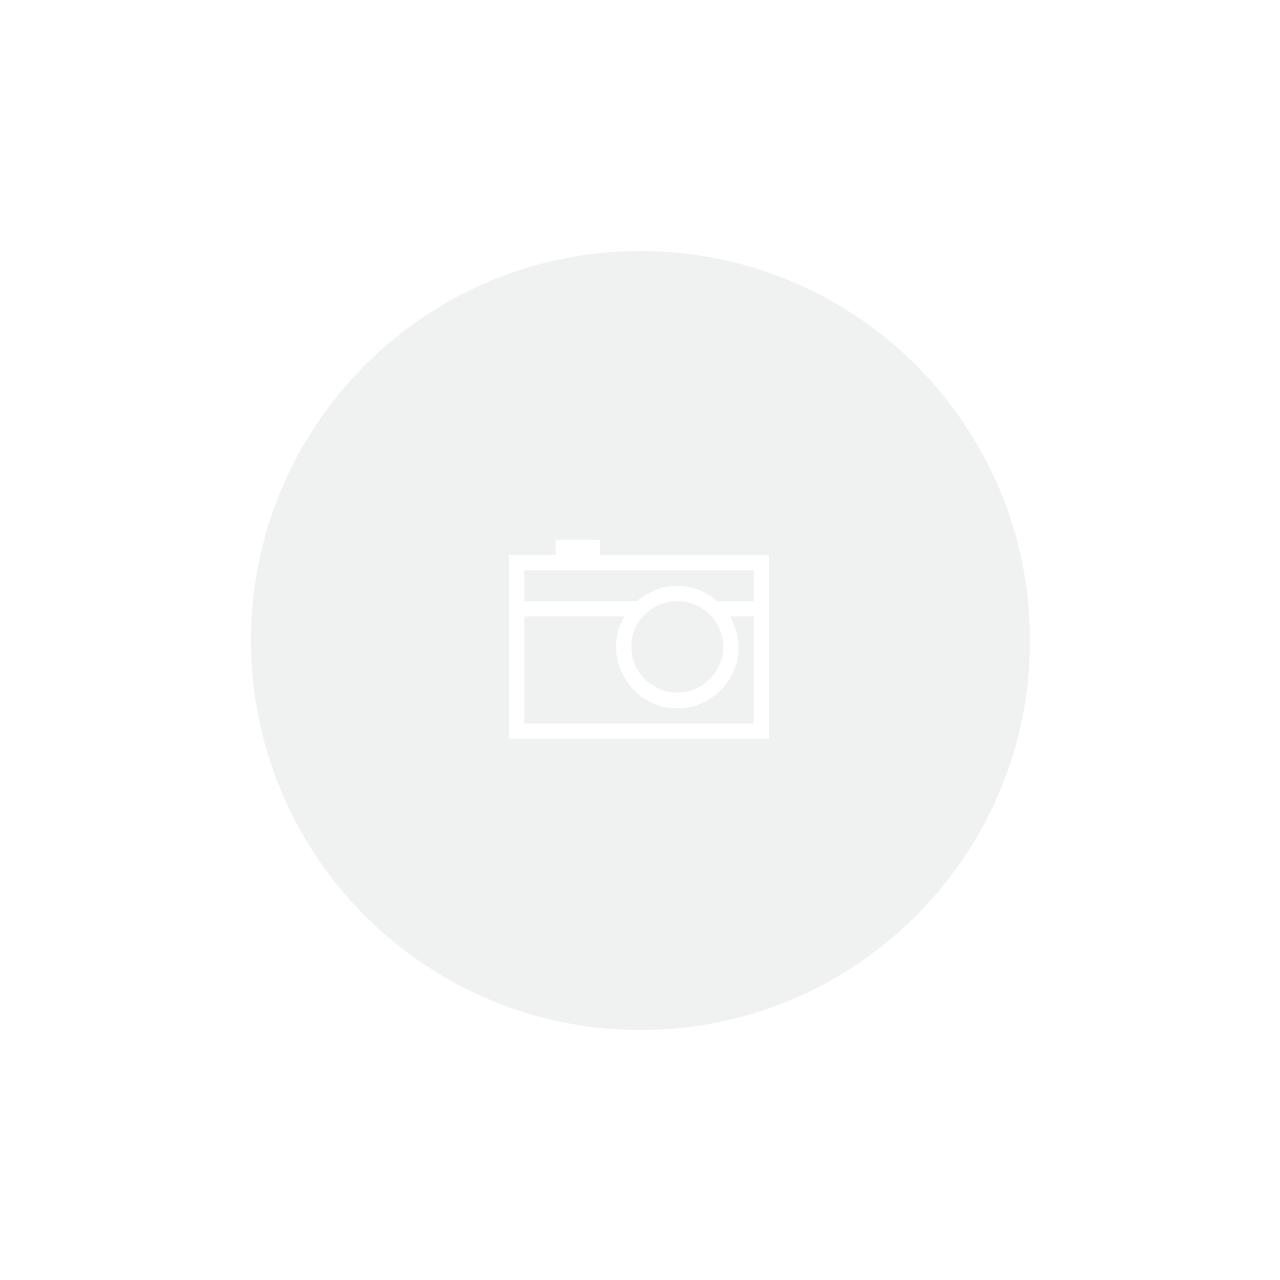 Blusa de Shape Justo com Alças - Liziane Richter